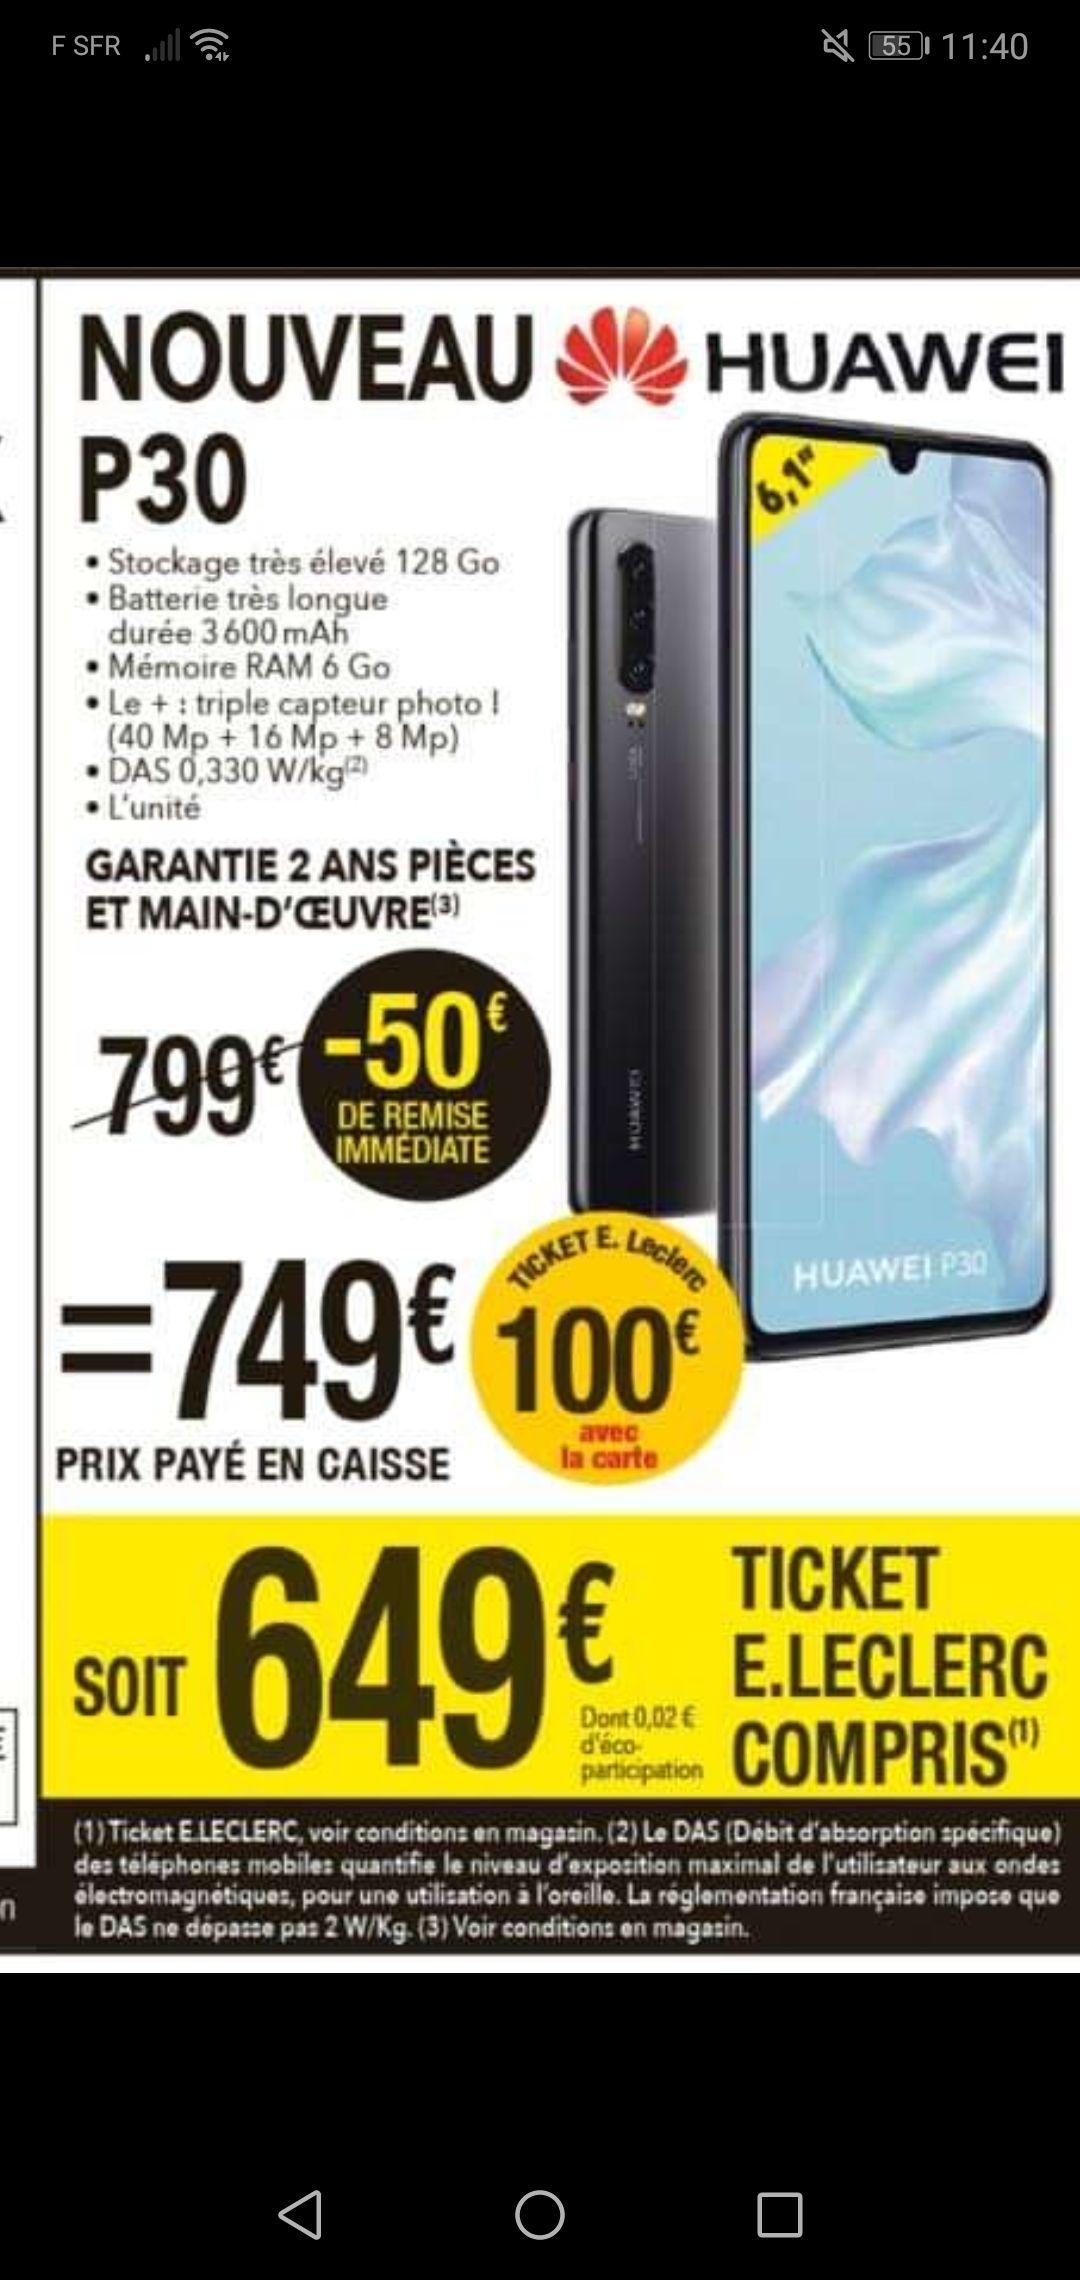 "Smartphone 6.1"" Huawei P30 - RAM 6Go, ROM 128 Go (via 100€ en tickets E.Leclerc) - Gouesnou (29)"